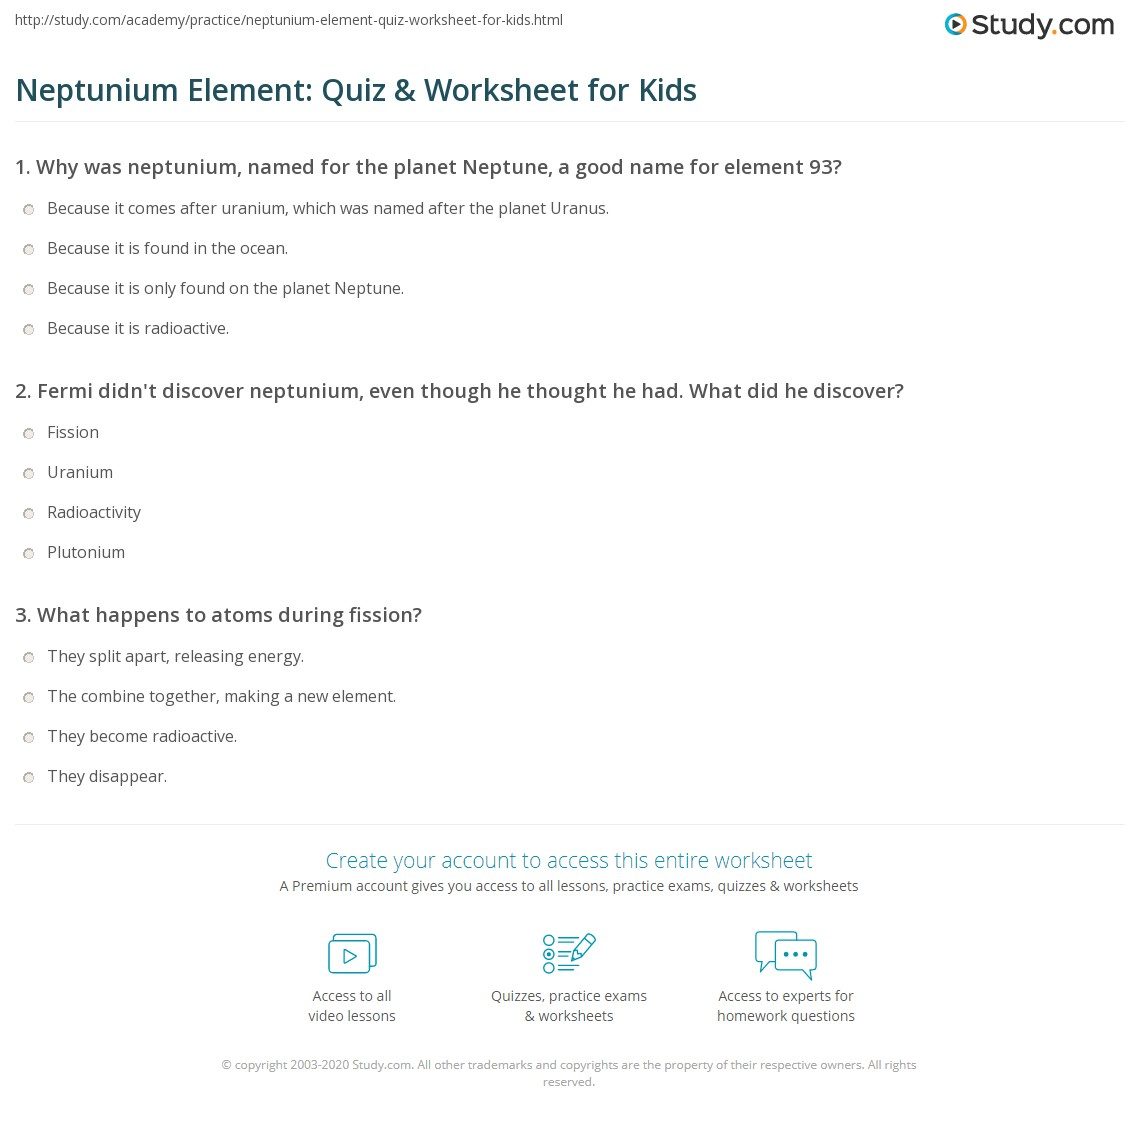 Neptunium Element Quiz Amp Worksheet For Kids